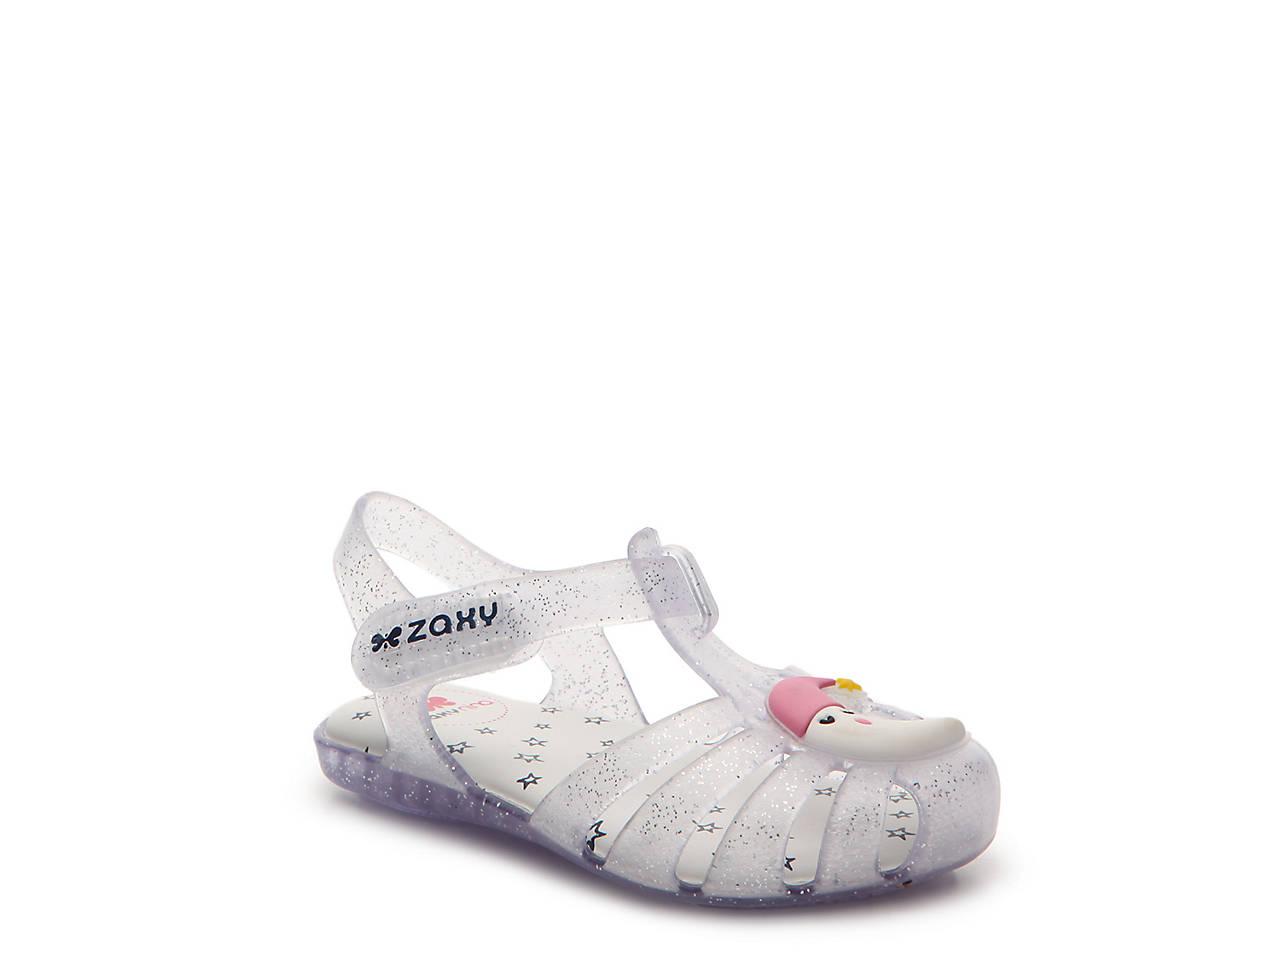 824f69800faa Zaxy Happy Moon Toddler Jelly Sandal Kids Shoes